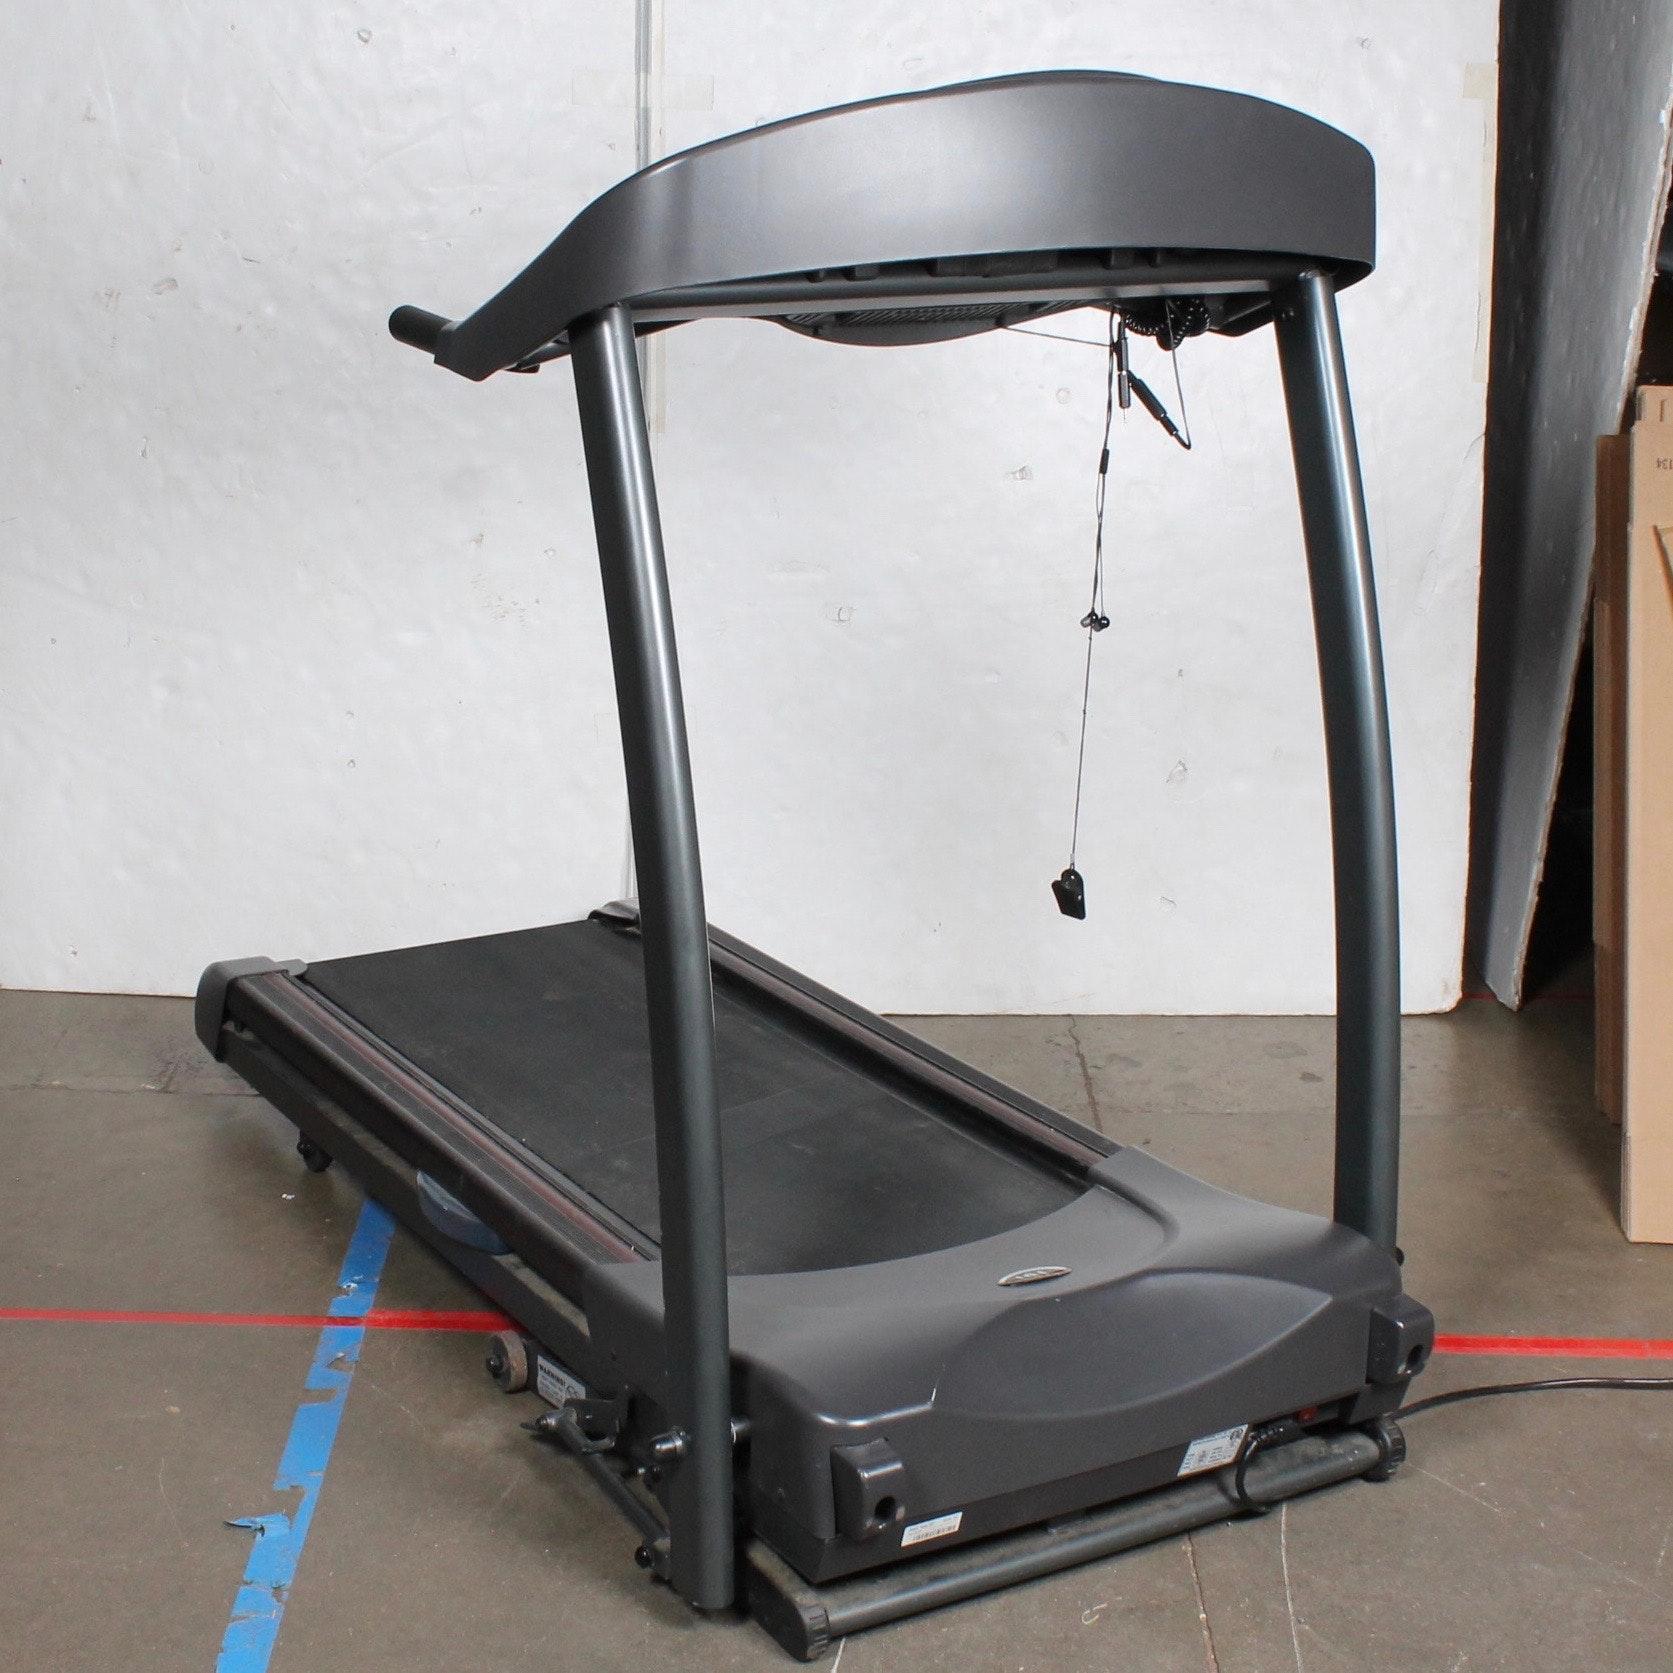 Horizon Fitness T61 Treadmill